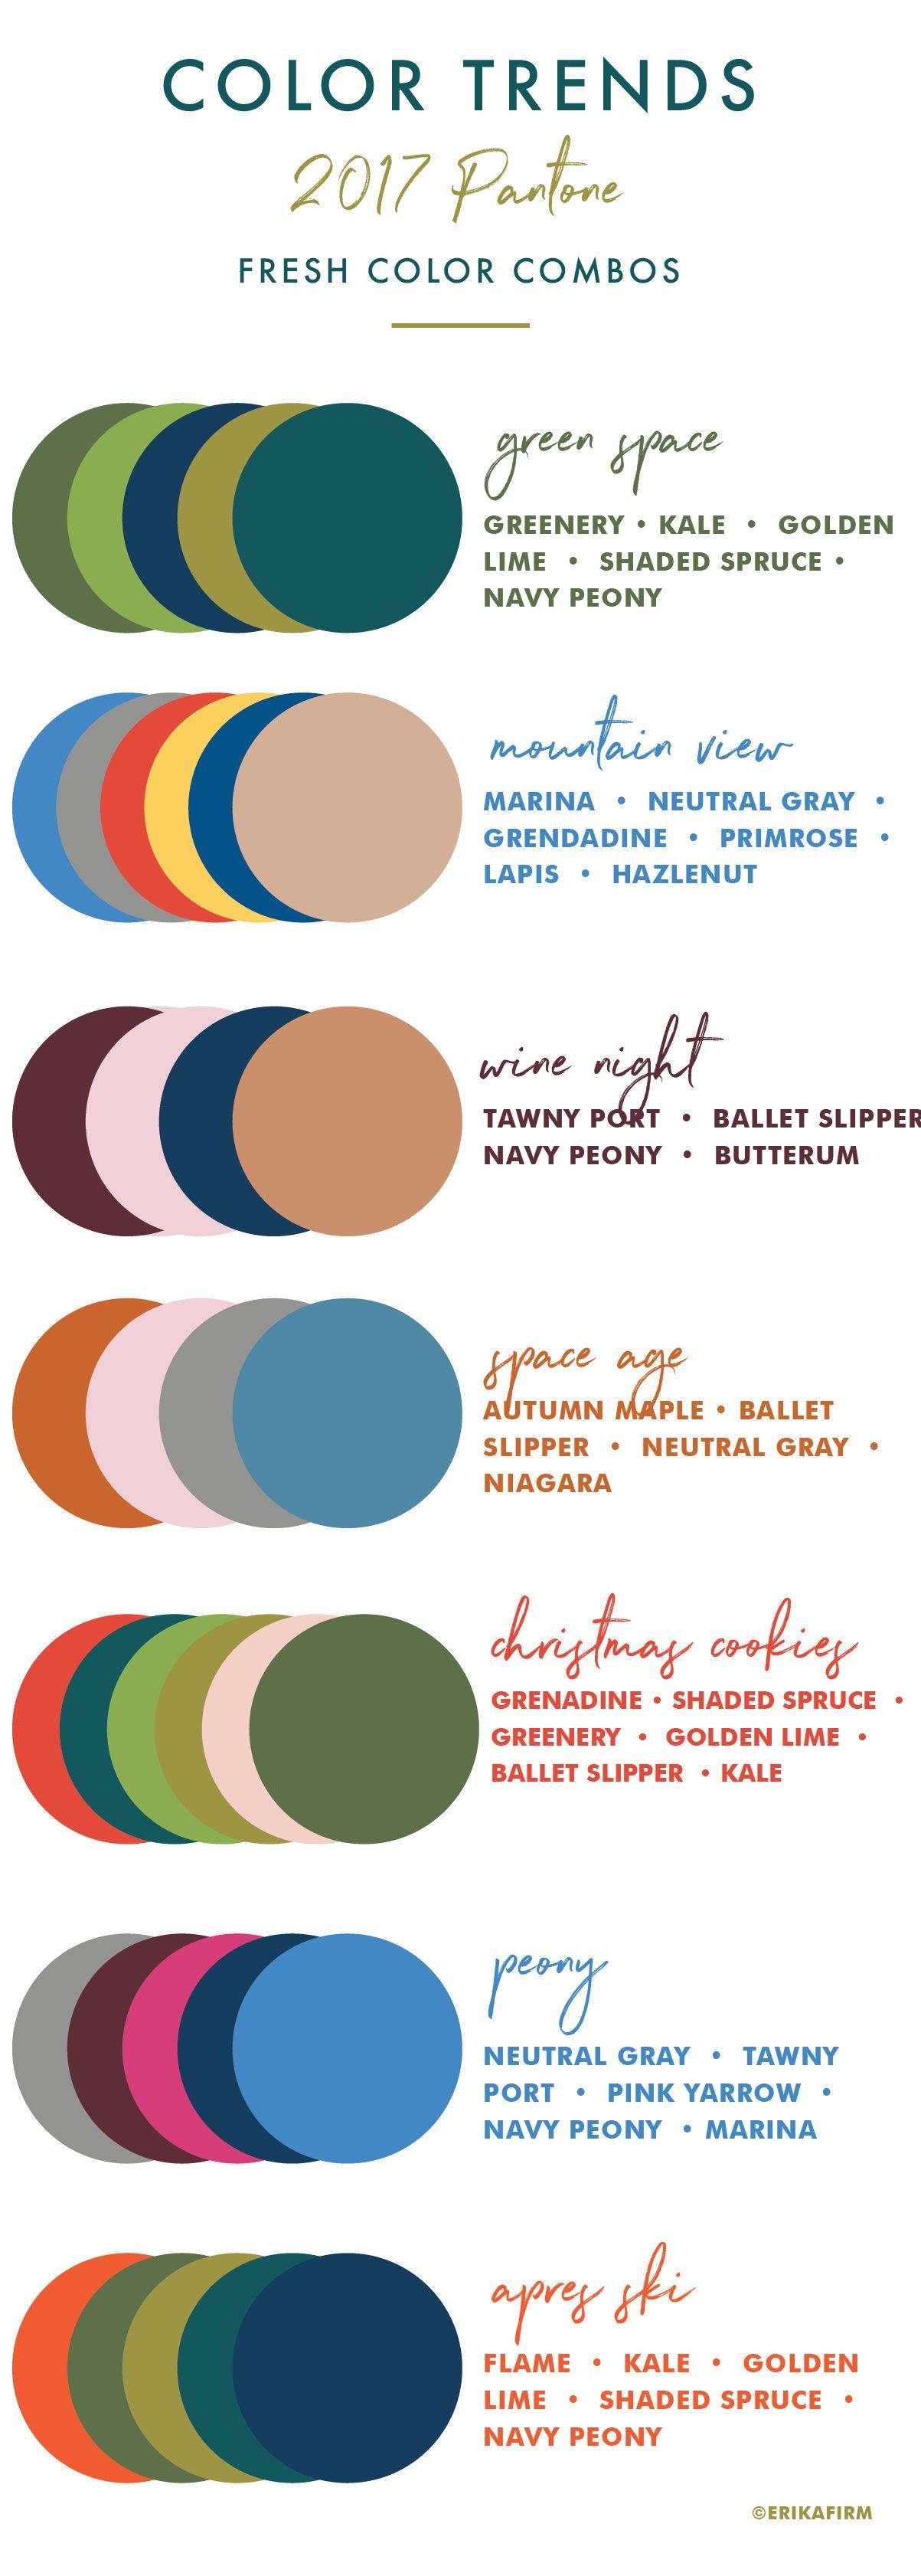 color trends 2017 color palettes by erika firm pretty color palettes pinterest farben. Black Bedroom Furniture Sets. Home Design Ideas